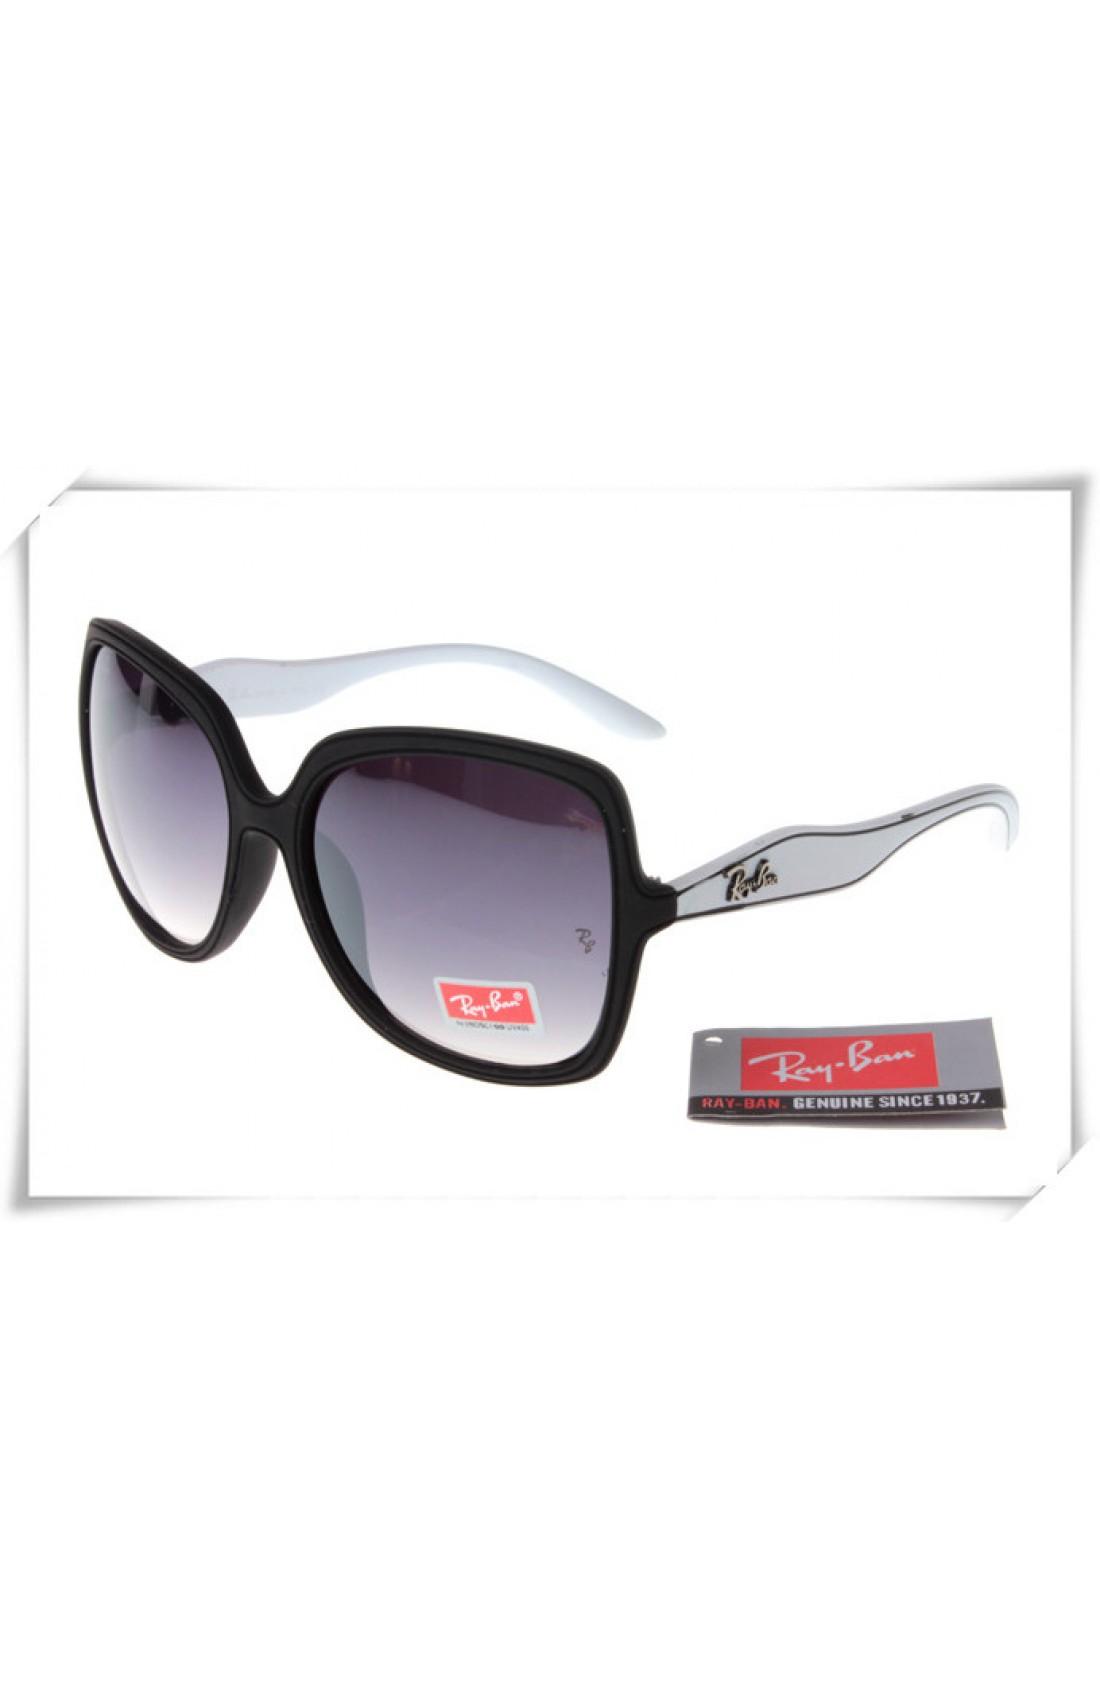 ca2b09e9c64 Replica Ray Ban RB2085 Jakie Ohh Sunglasses White Black Frame Grey ...